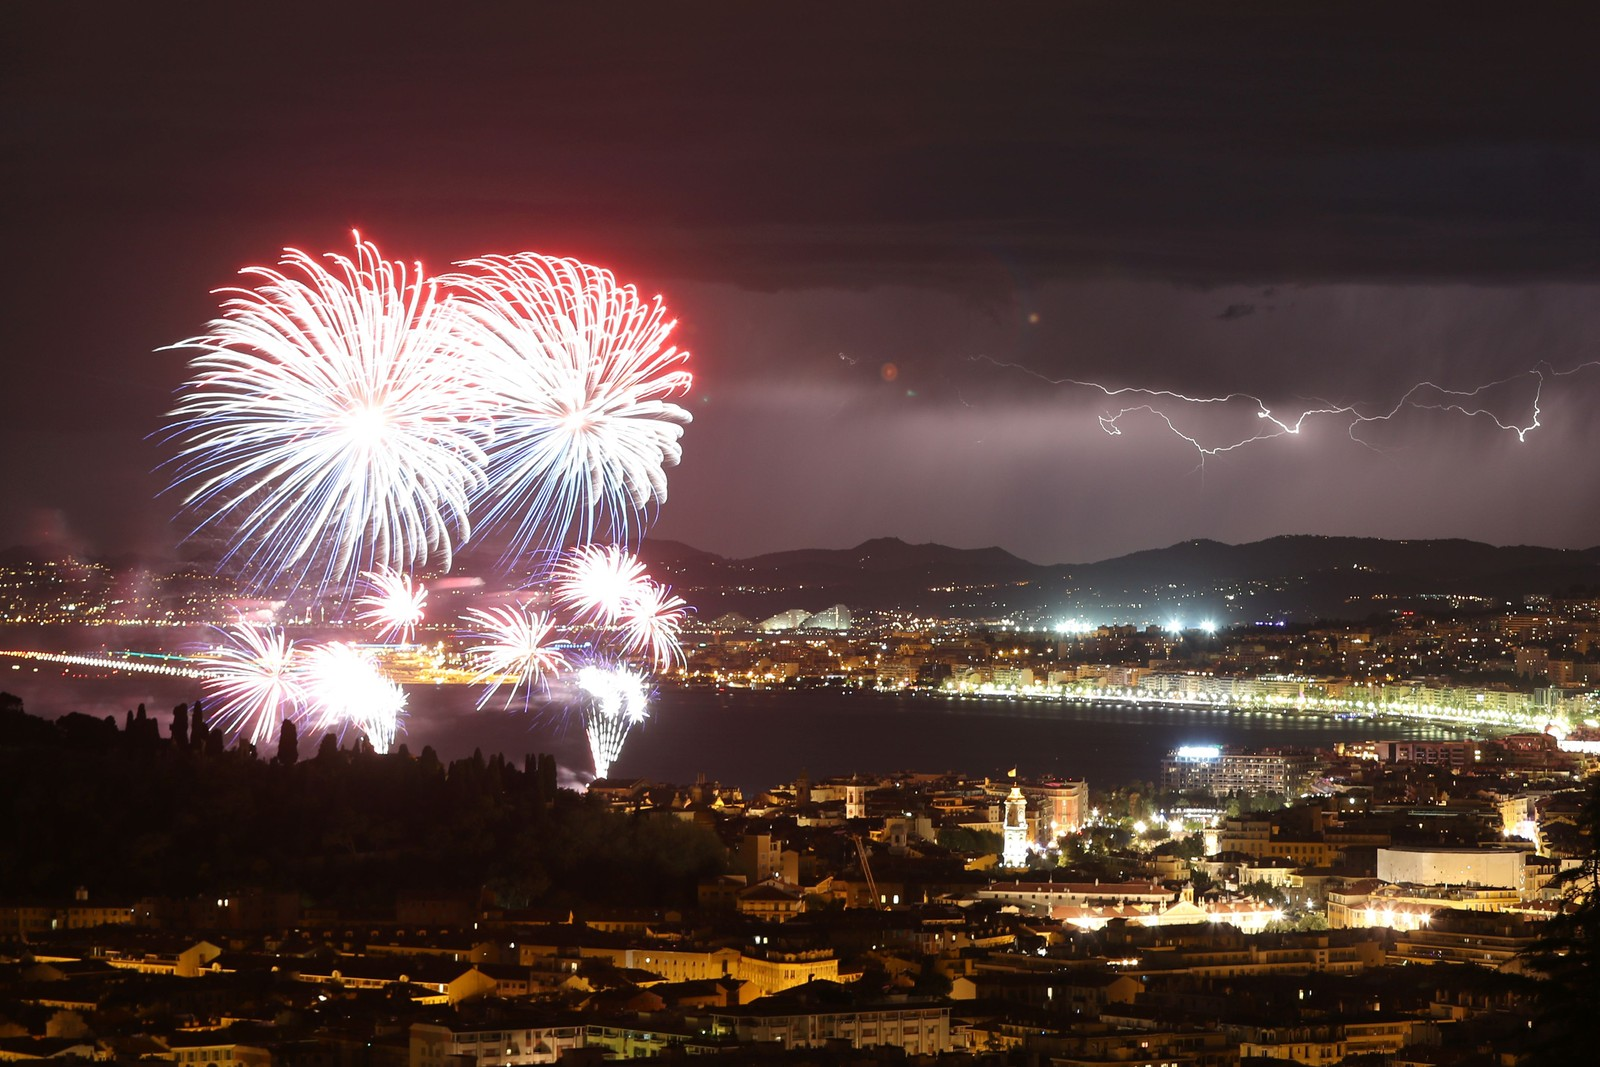 Festfyrverkeriet over Nice 14. juli 2016.